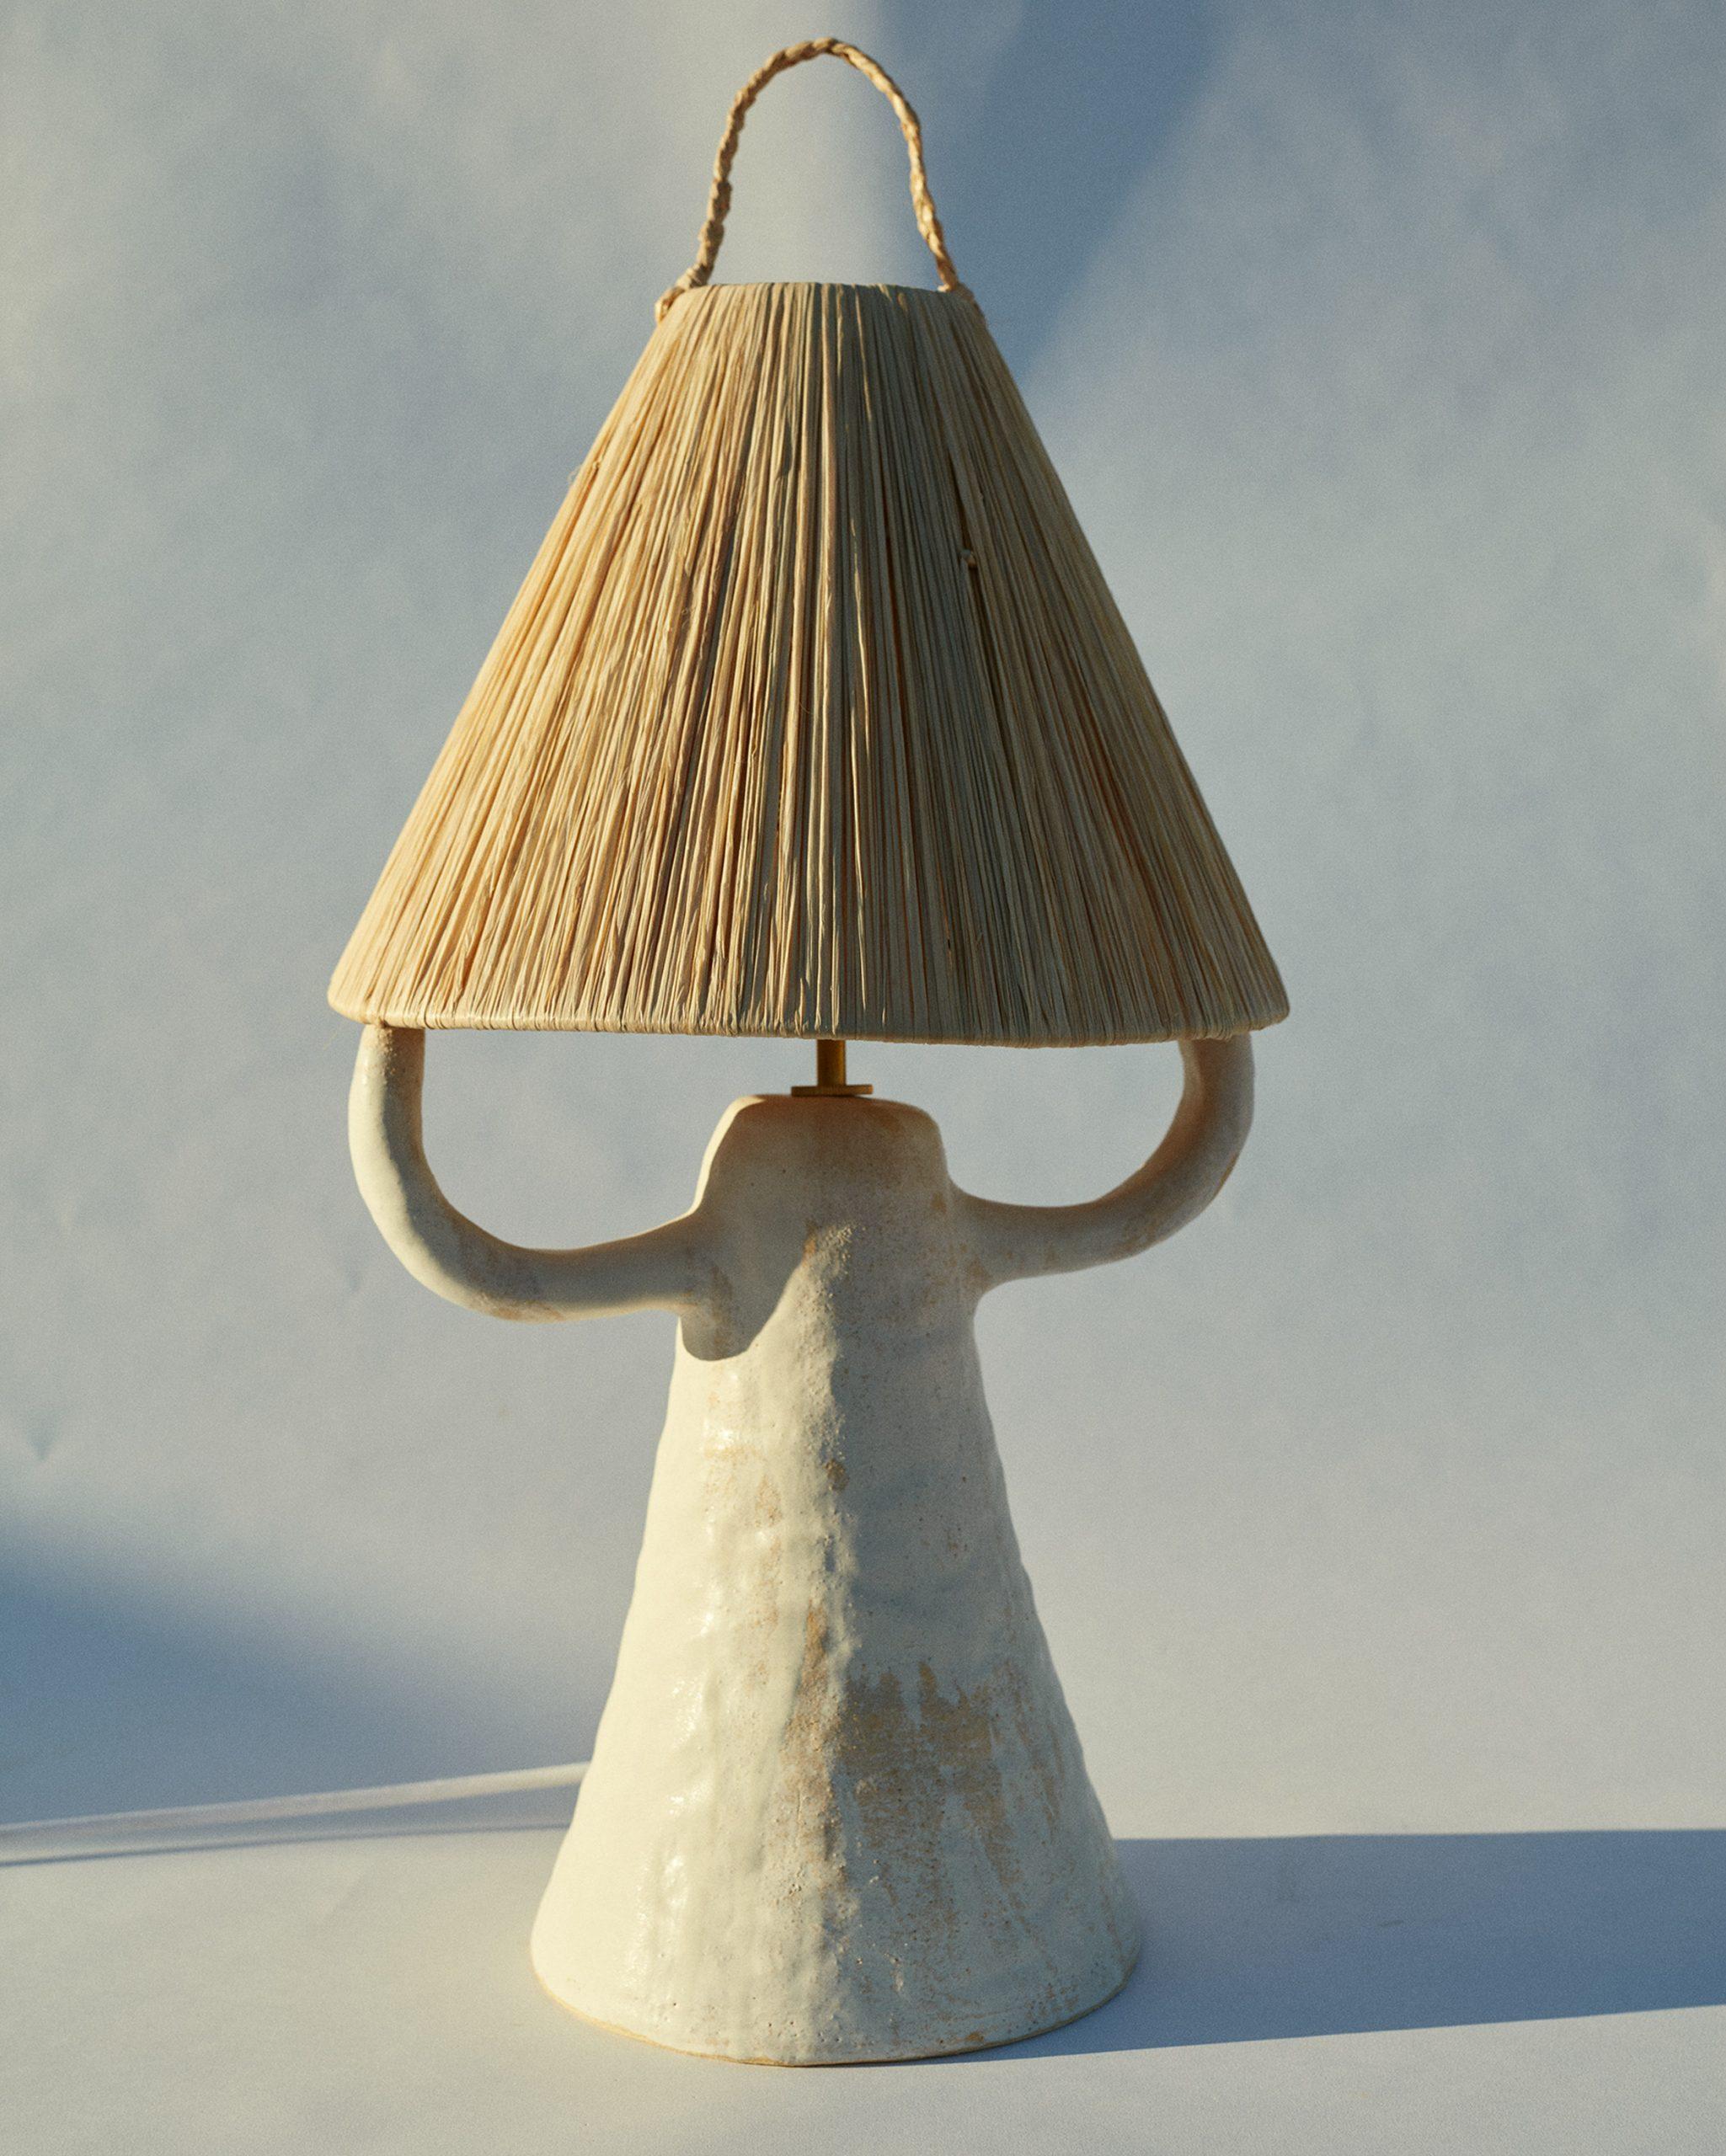 Bona lamp at TRNK's Provenanced exhibition